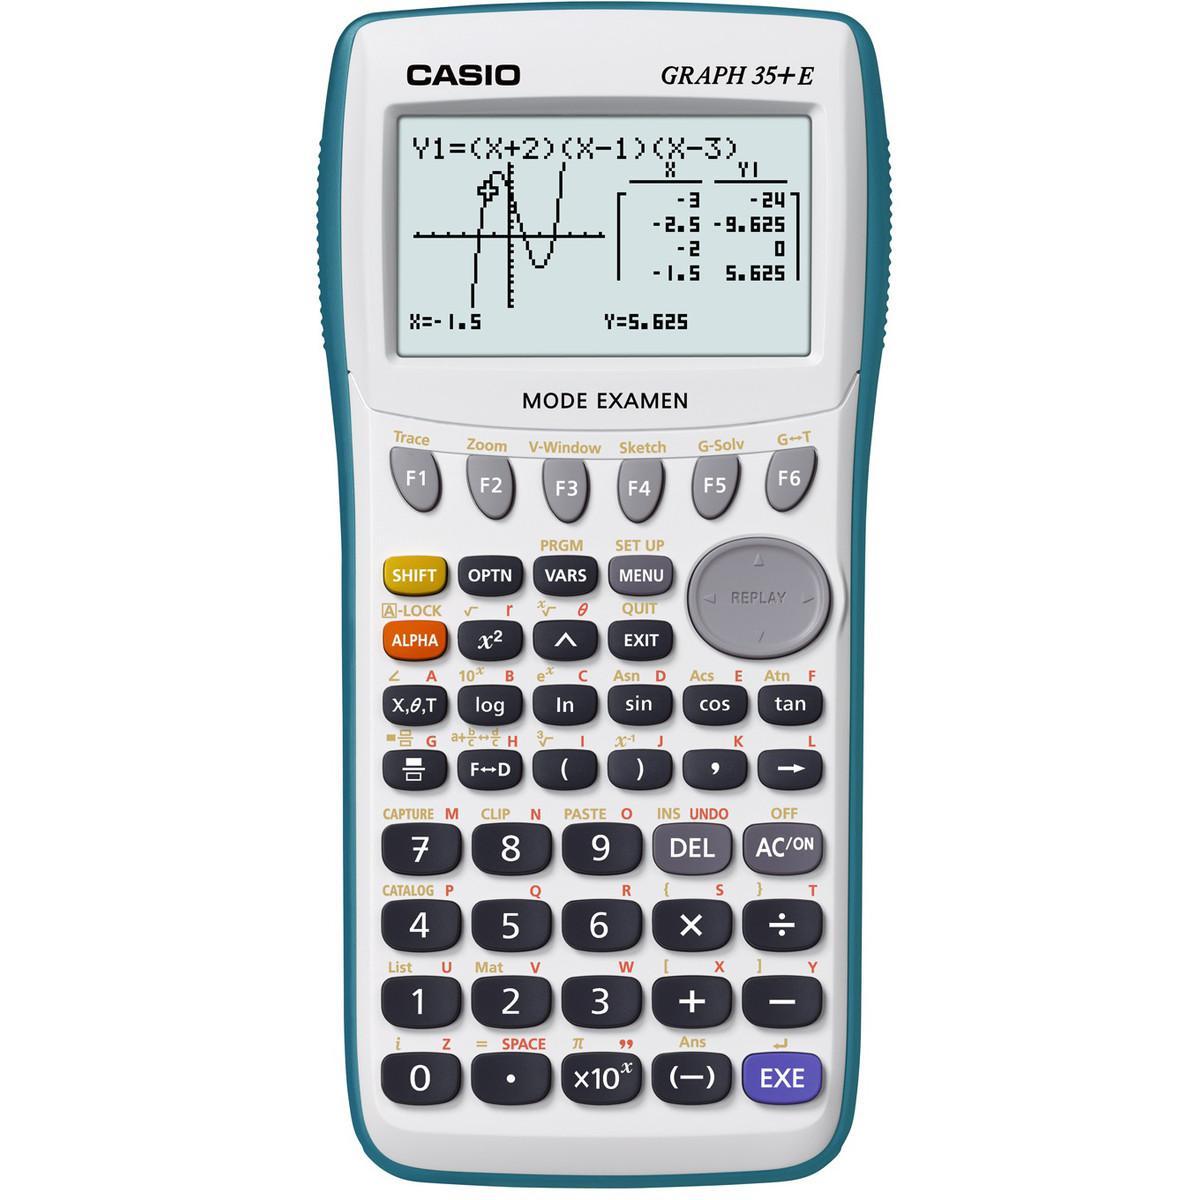 Calculatrice graphique Casio Graph 35+ - Blanc